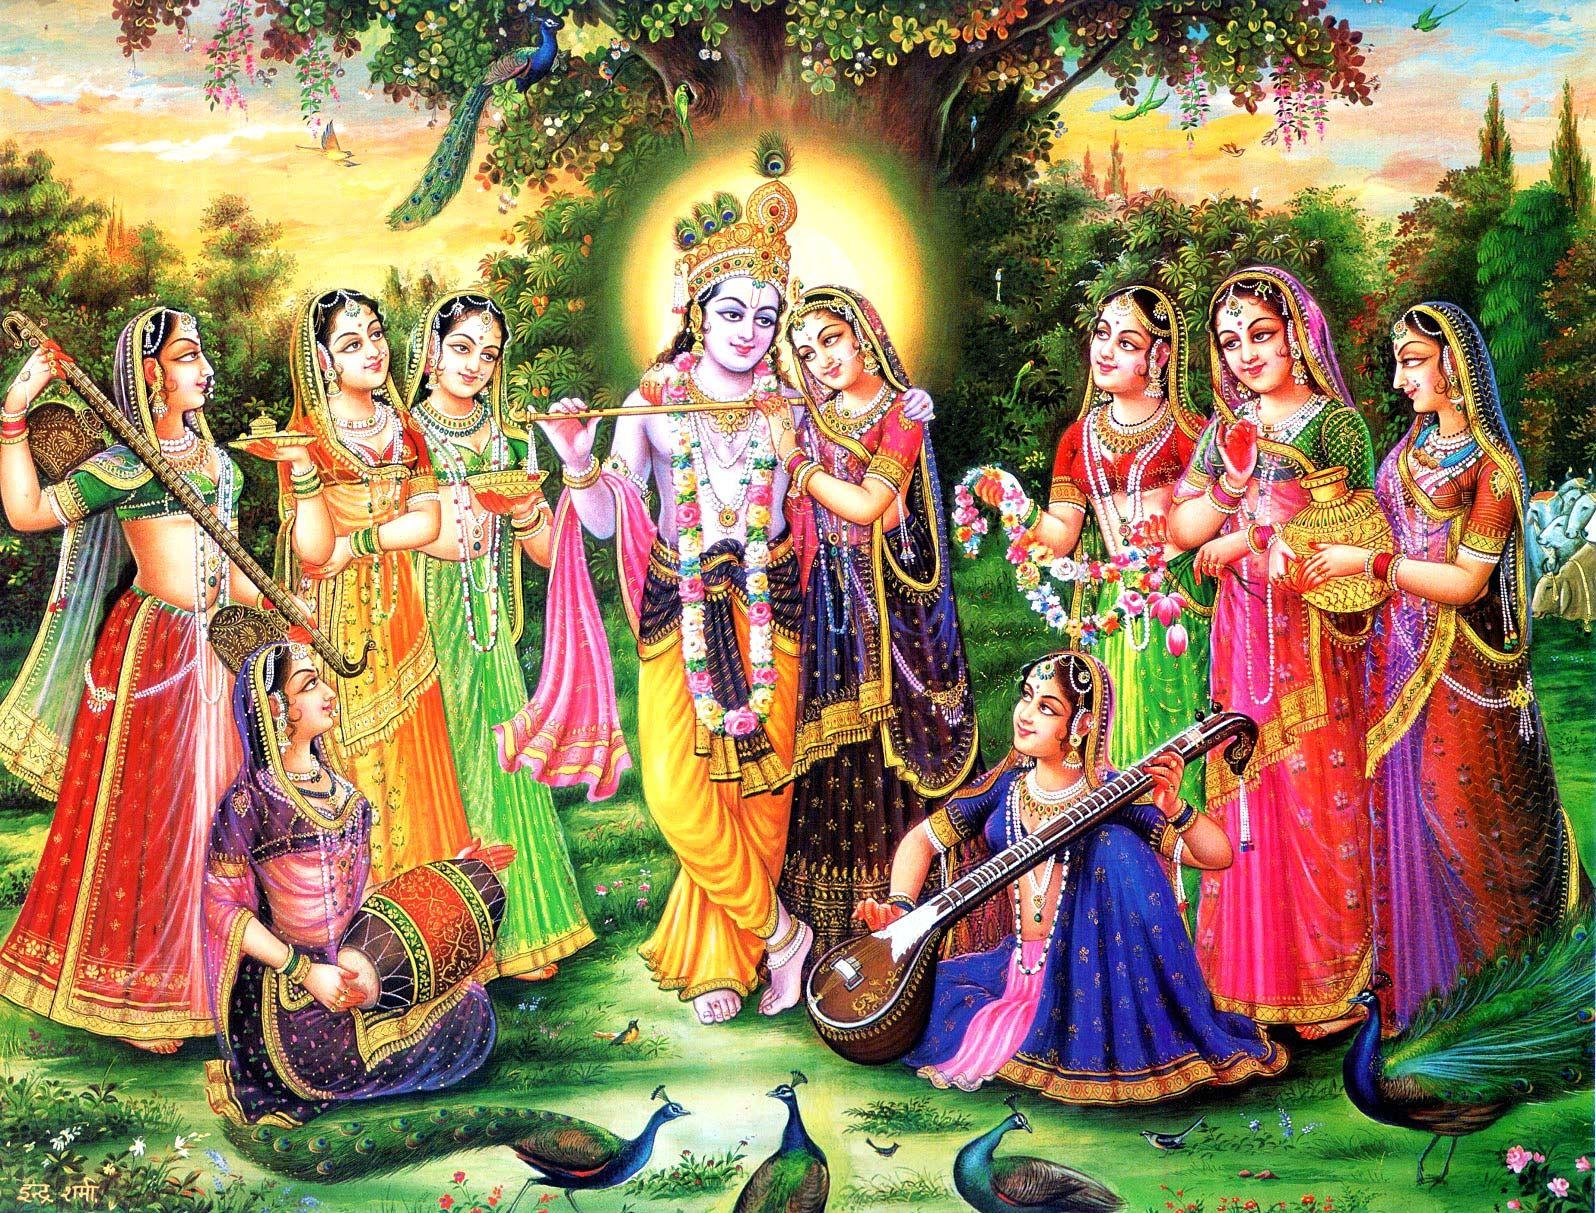 Wallpaper download bhakti - Free Download Lord Krishna Wallpapers